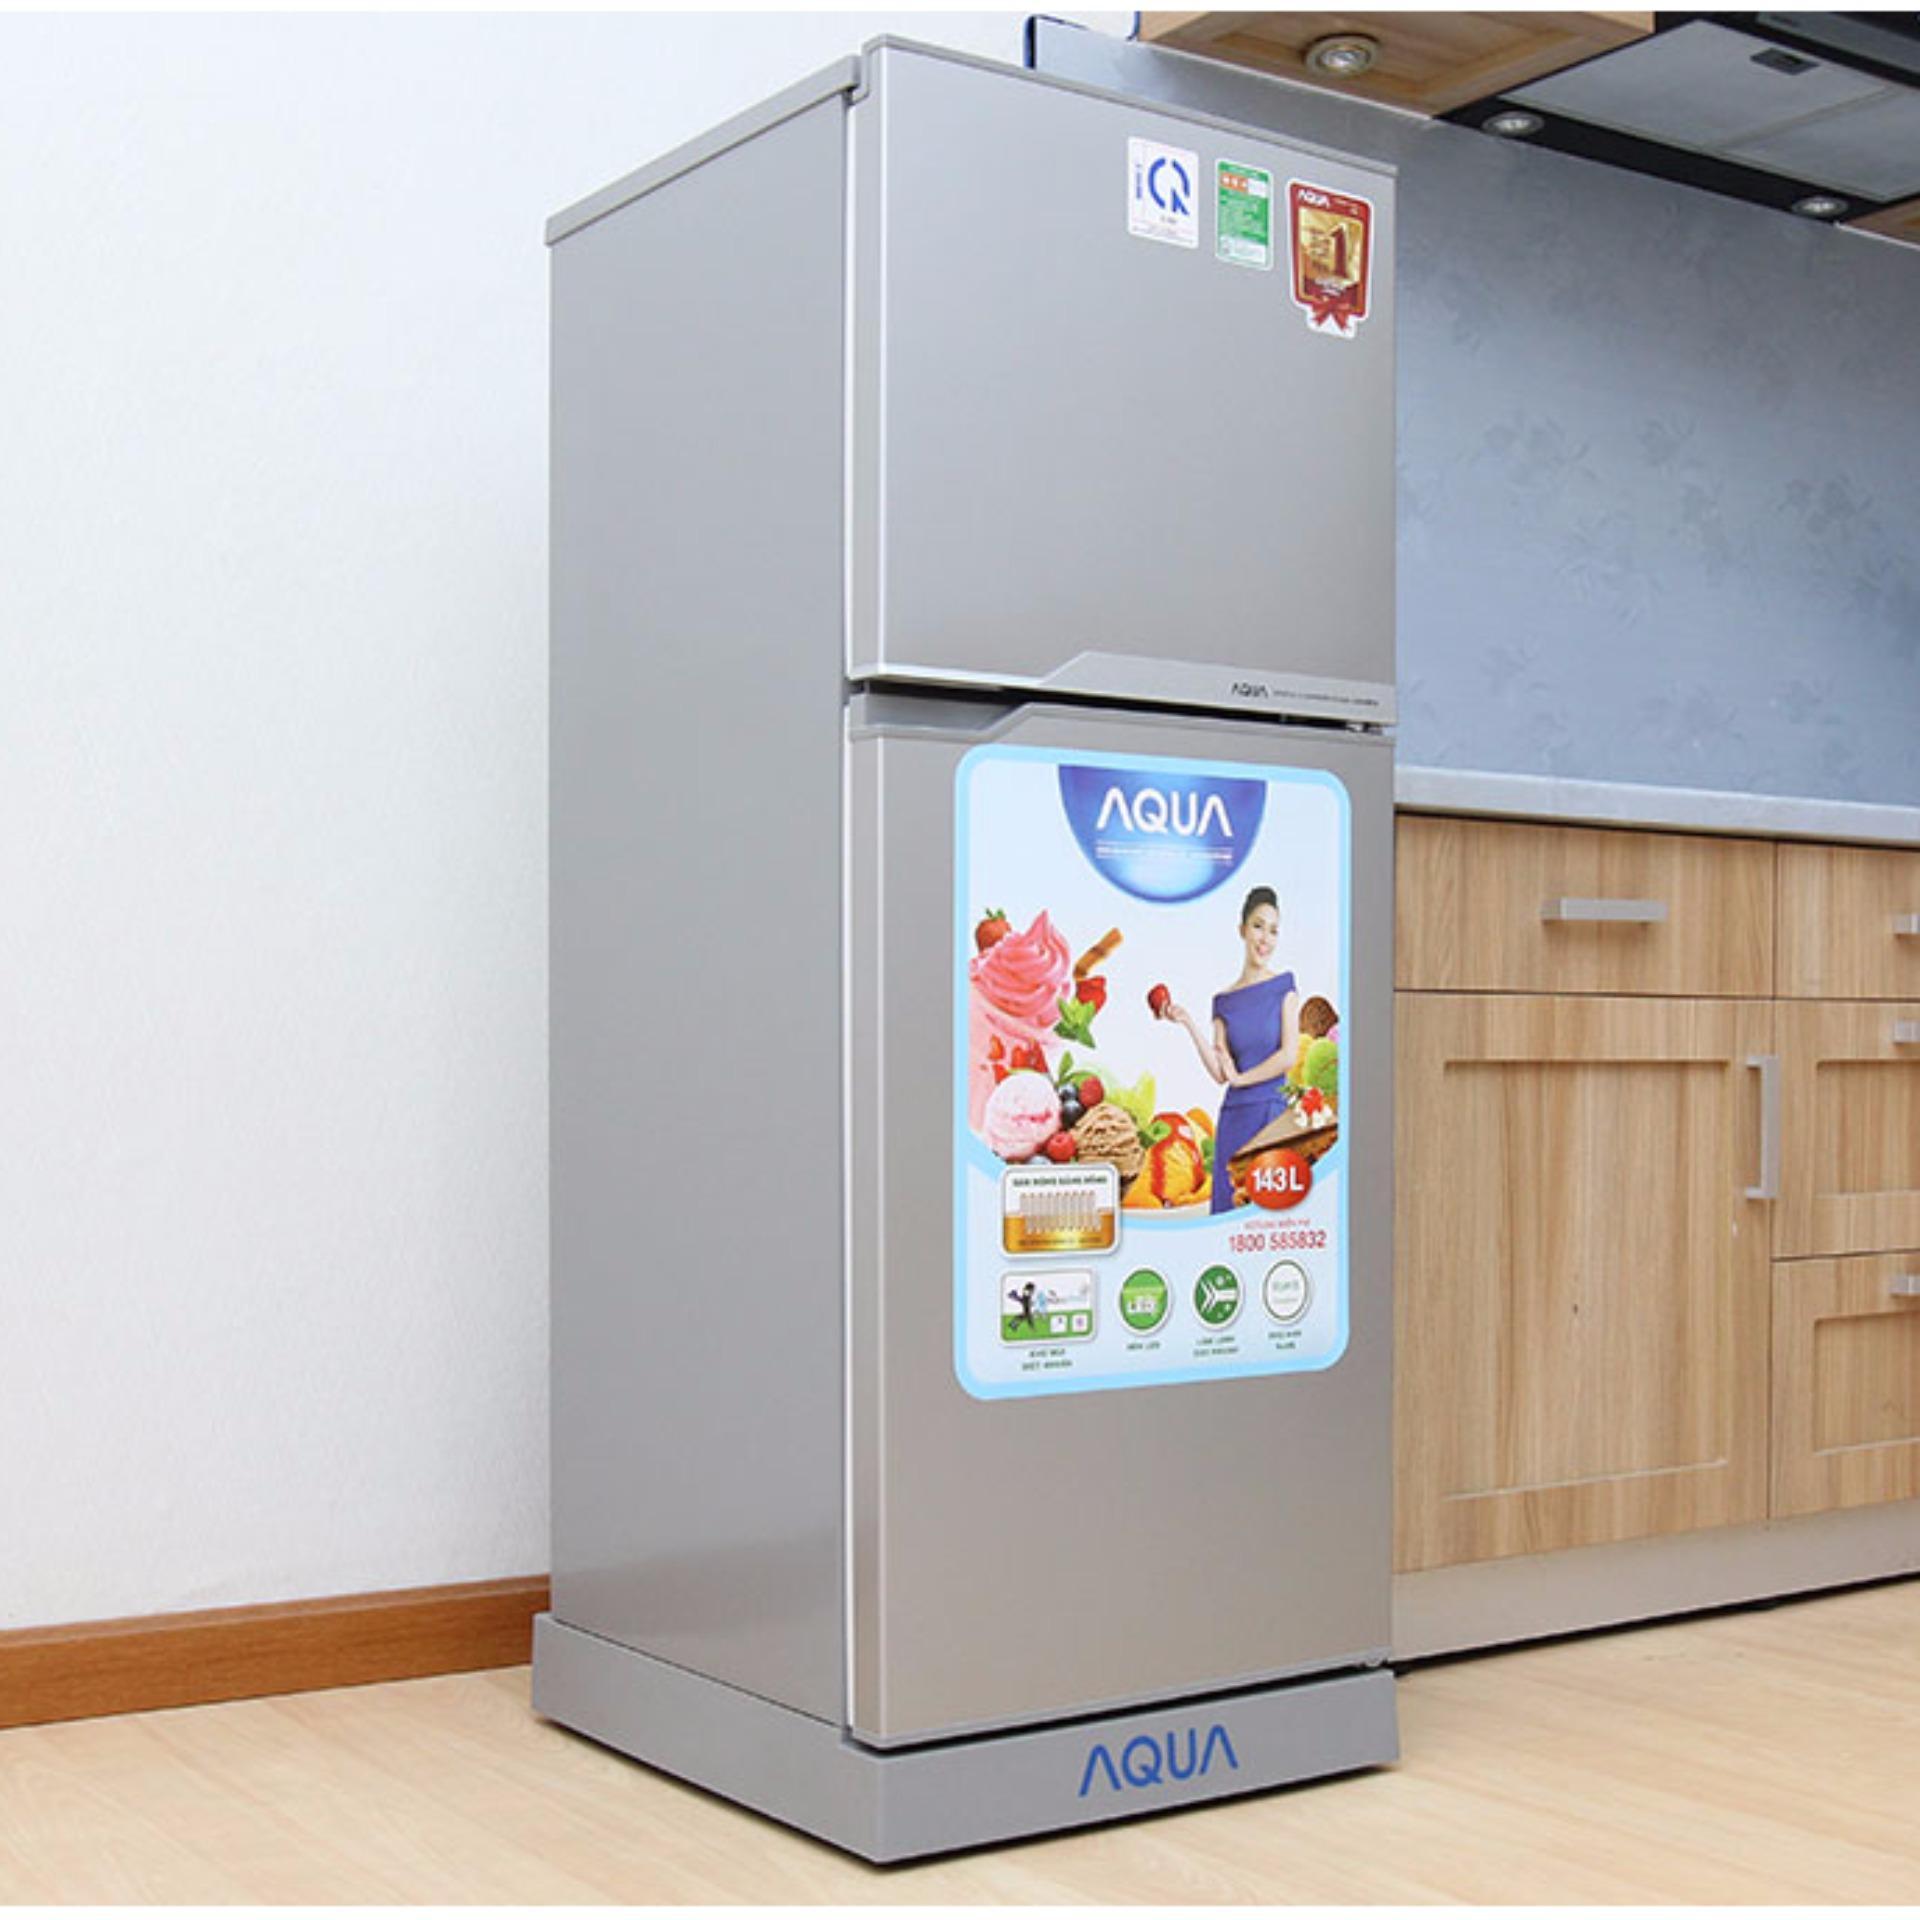 Tủ lạnh AQUA AQR-145BN